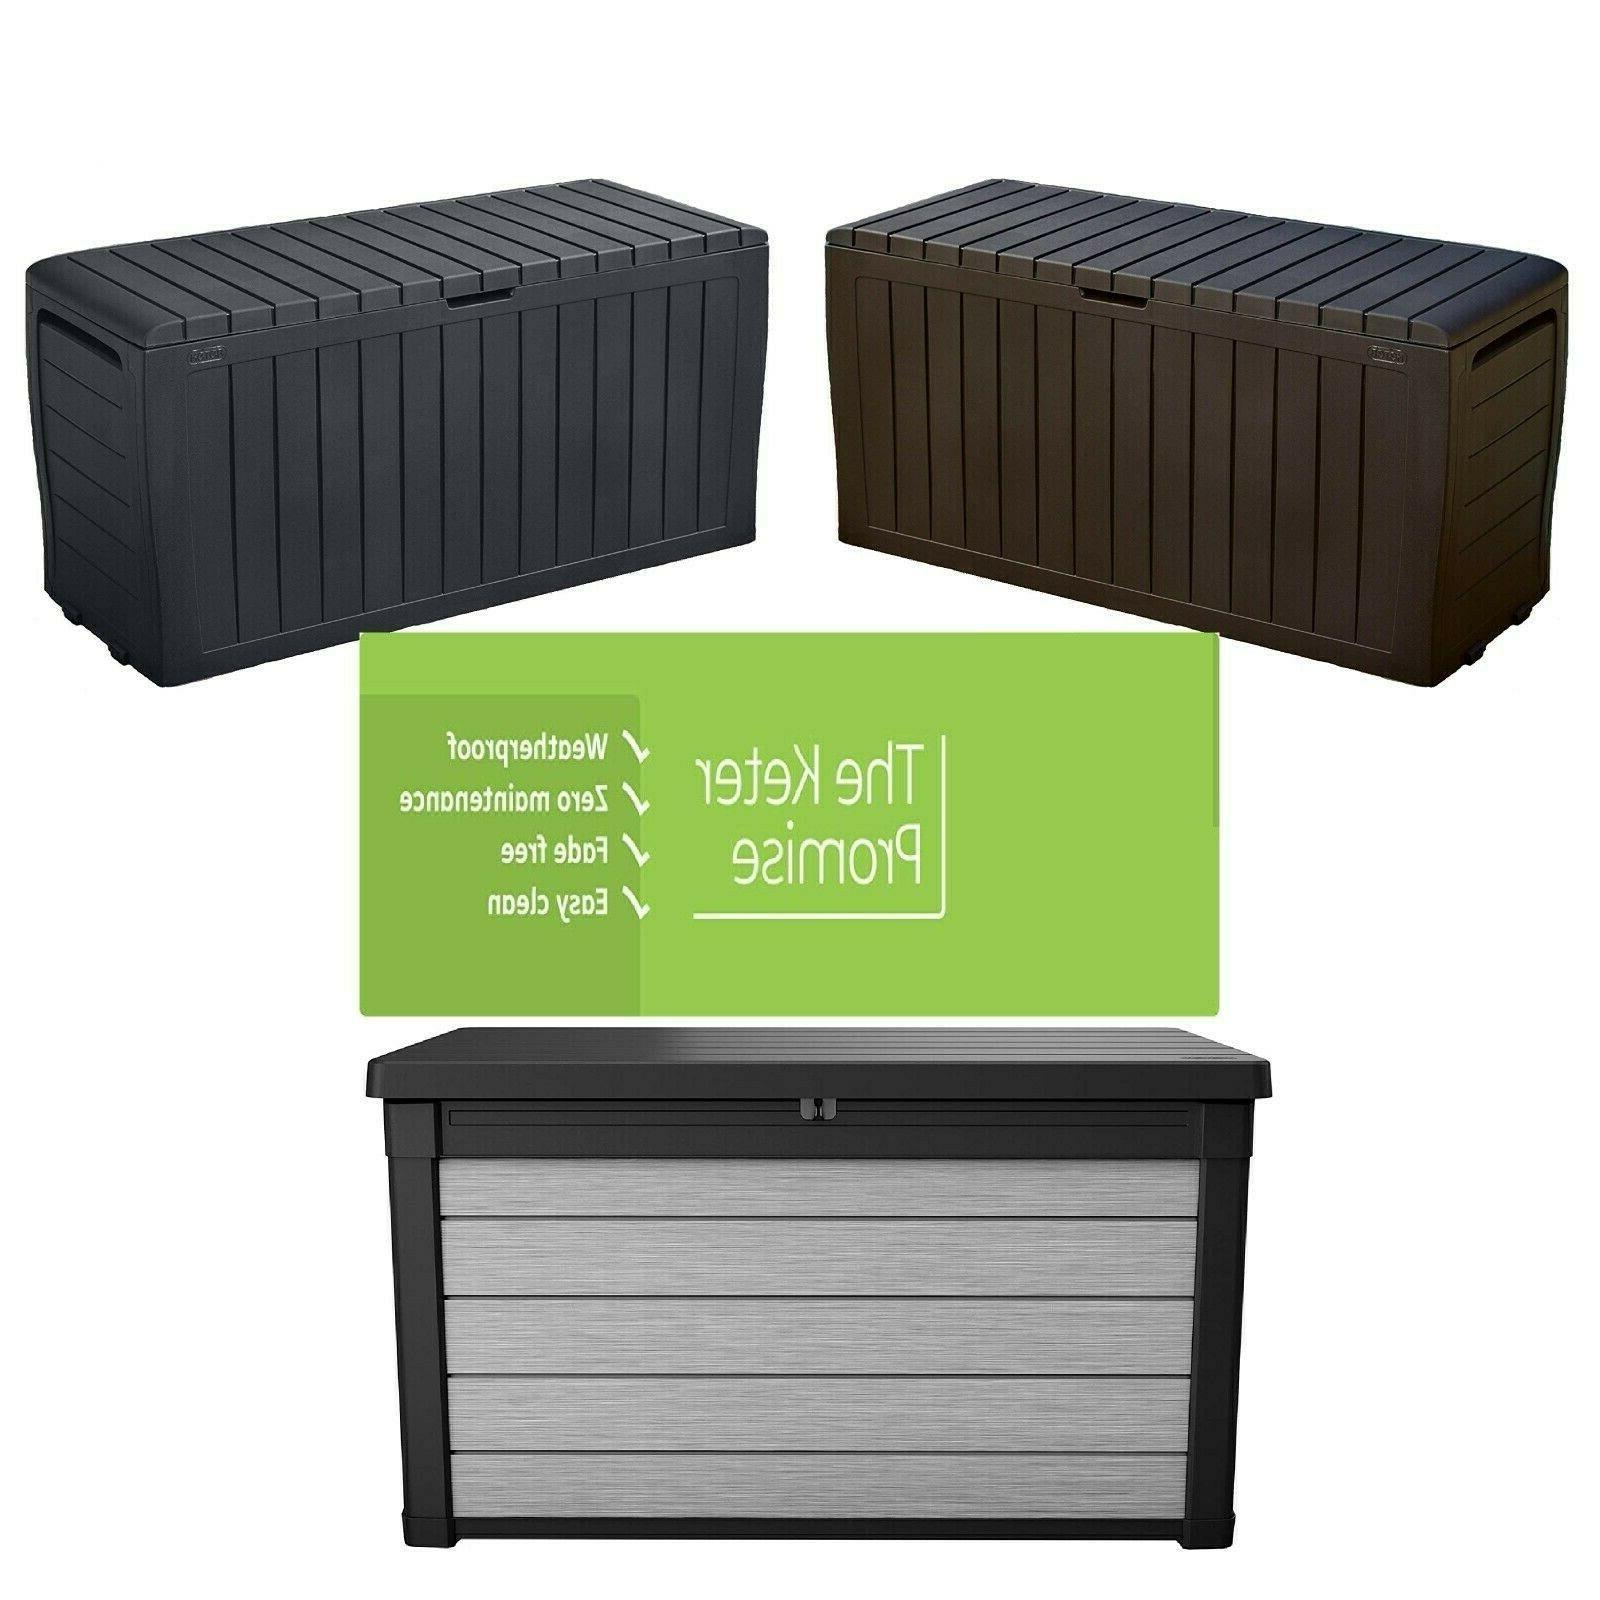 gallon resin outdoor storage box for patio